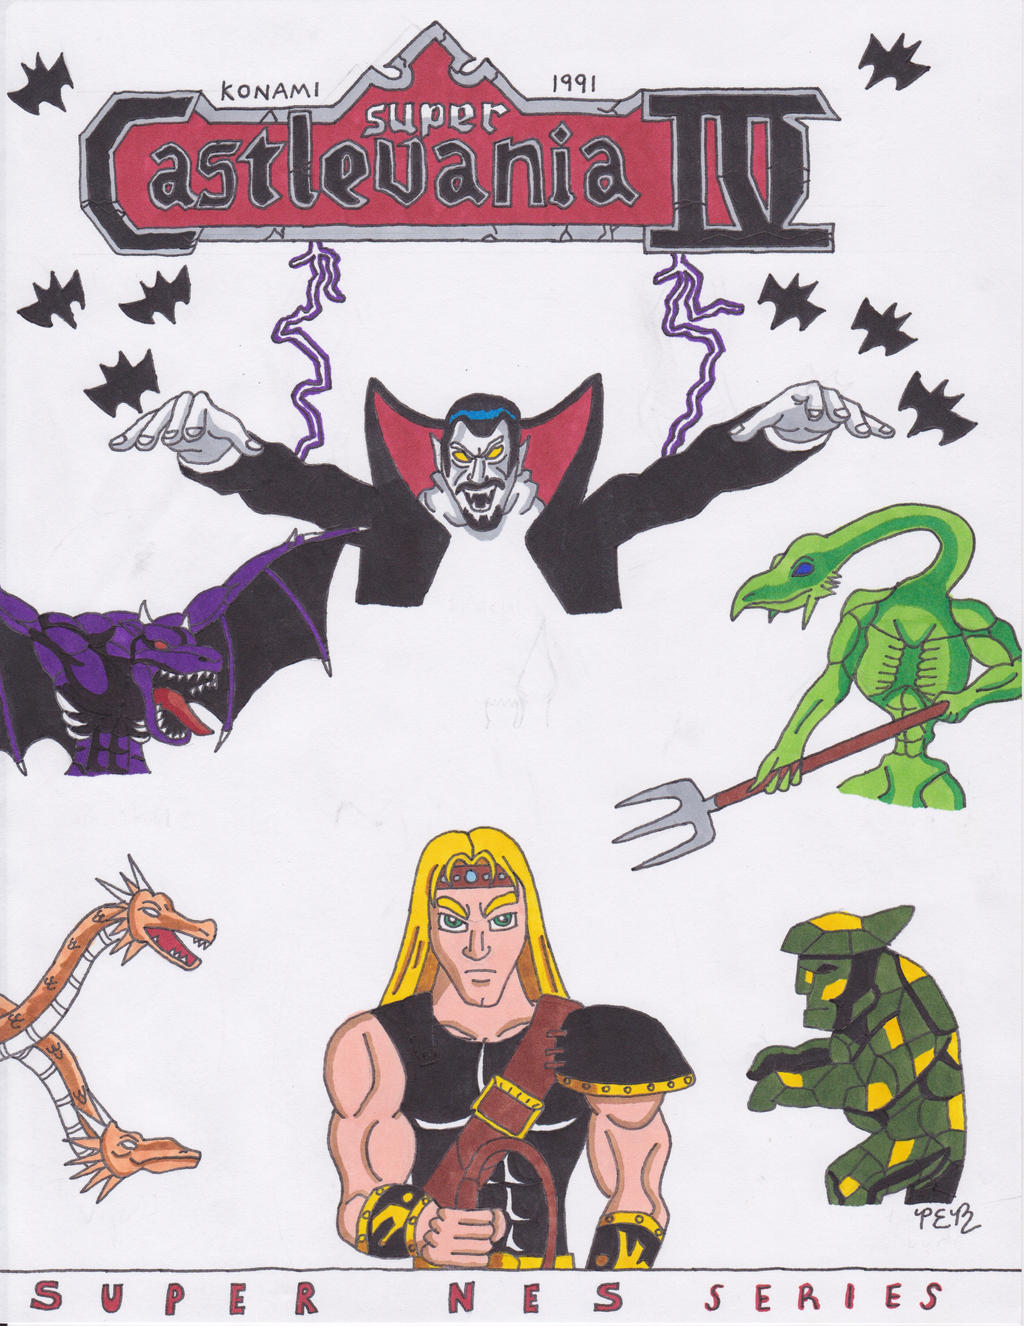 Super NES Series: Super Castlevania IV by NinjaDude719